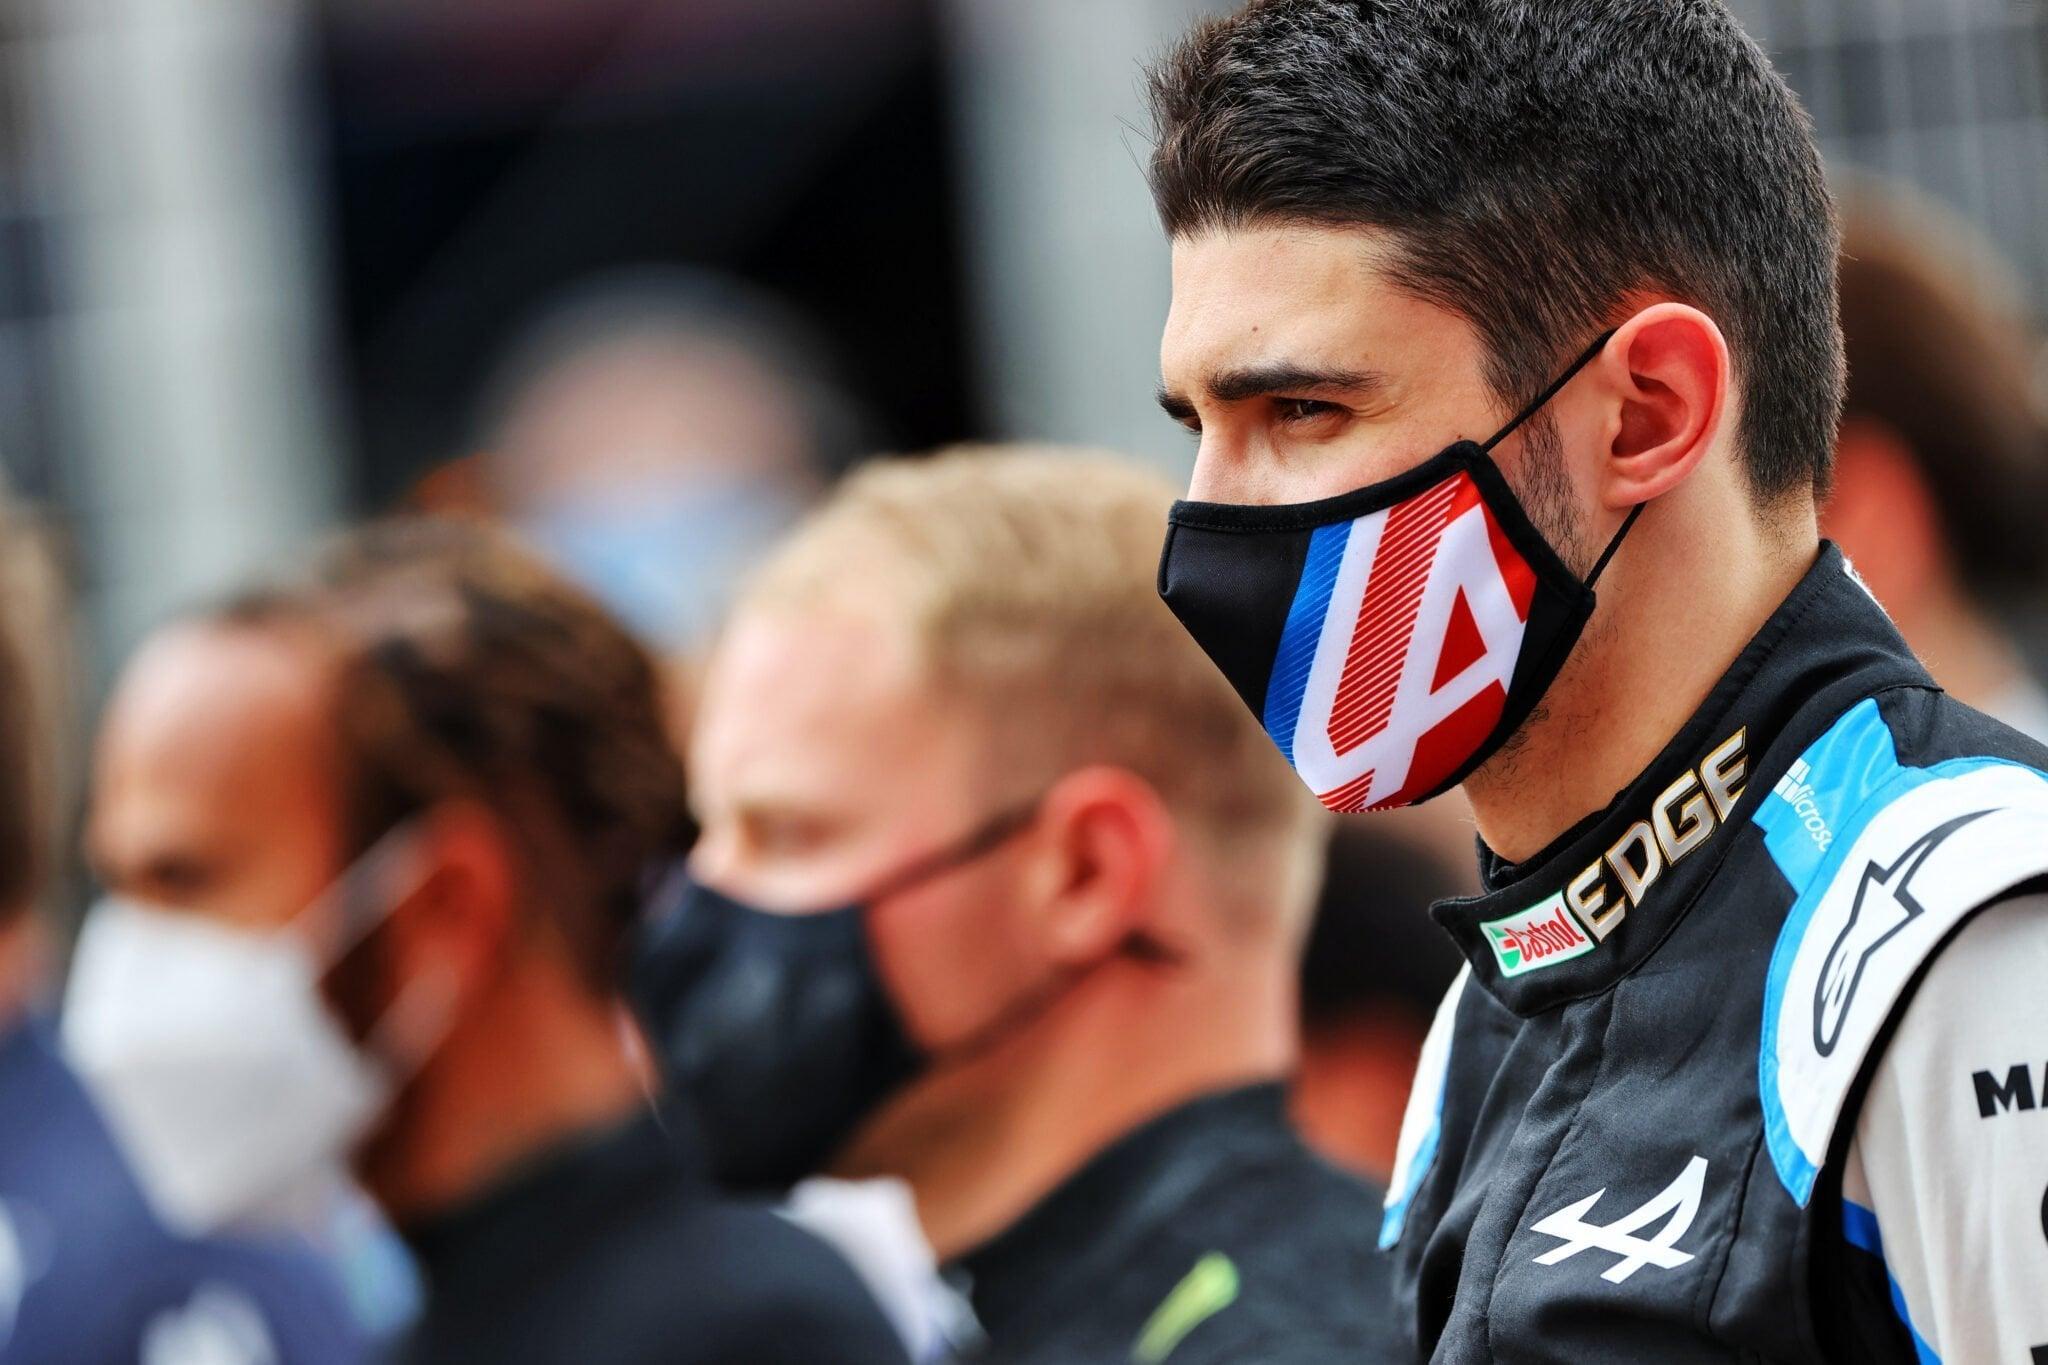 Alpine F1 Team A521 Alonso Ocon Grand Prix Espagne 2021 course 3 | Alpine F1 : Un Grand-Prix de Monaco attendu de pied ferme